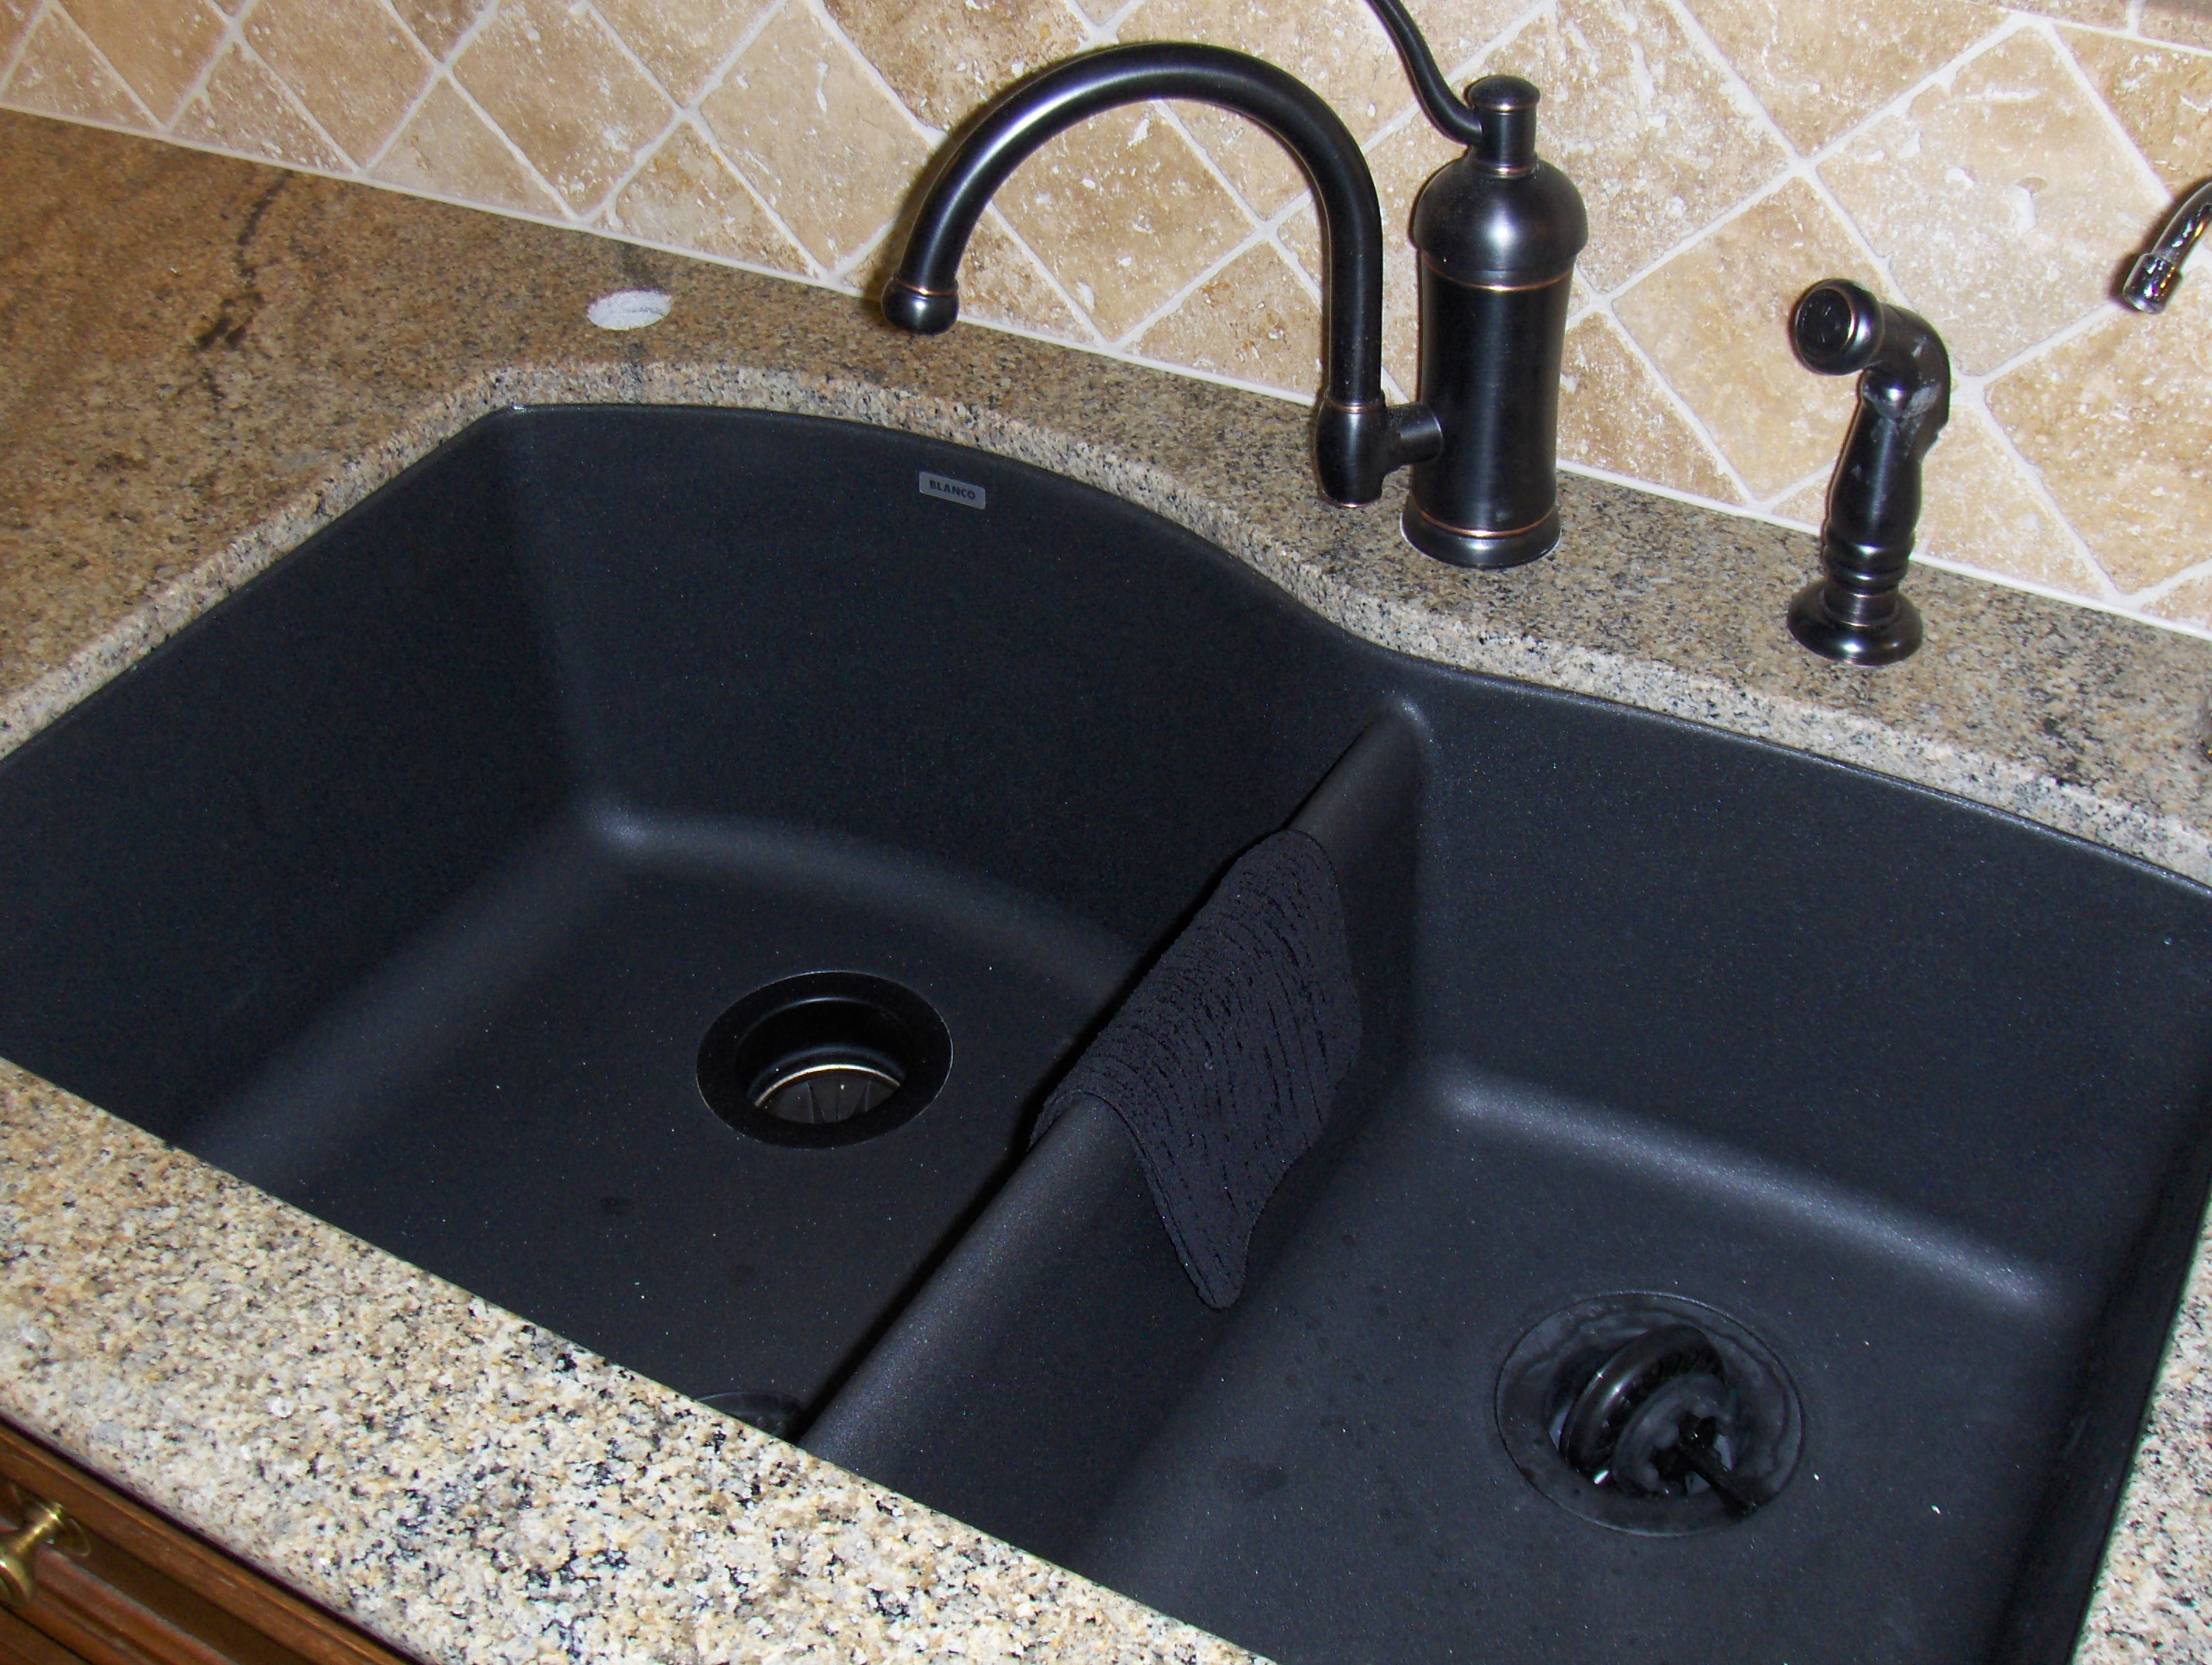 Bathroom Interior Kitchen Furniture Colors Of Granite Black Sinks High Resolution Image Home